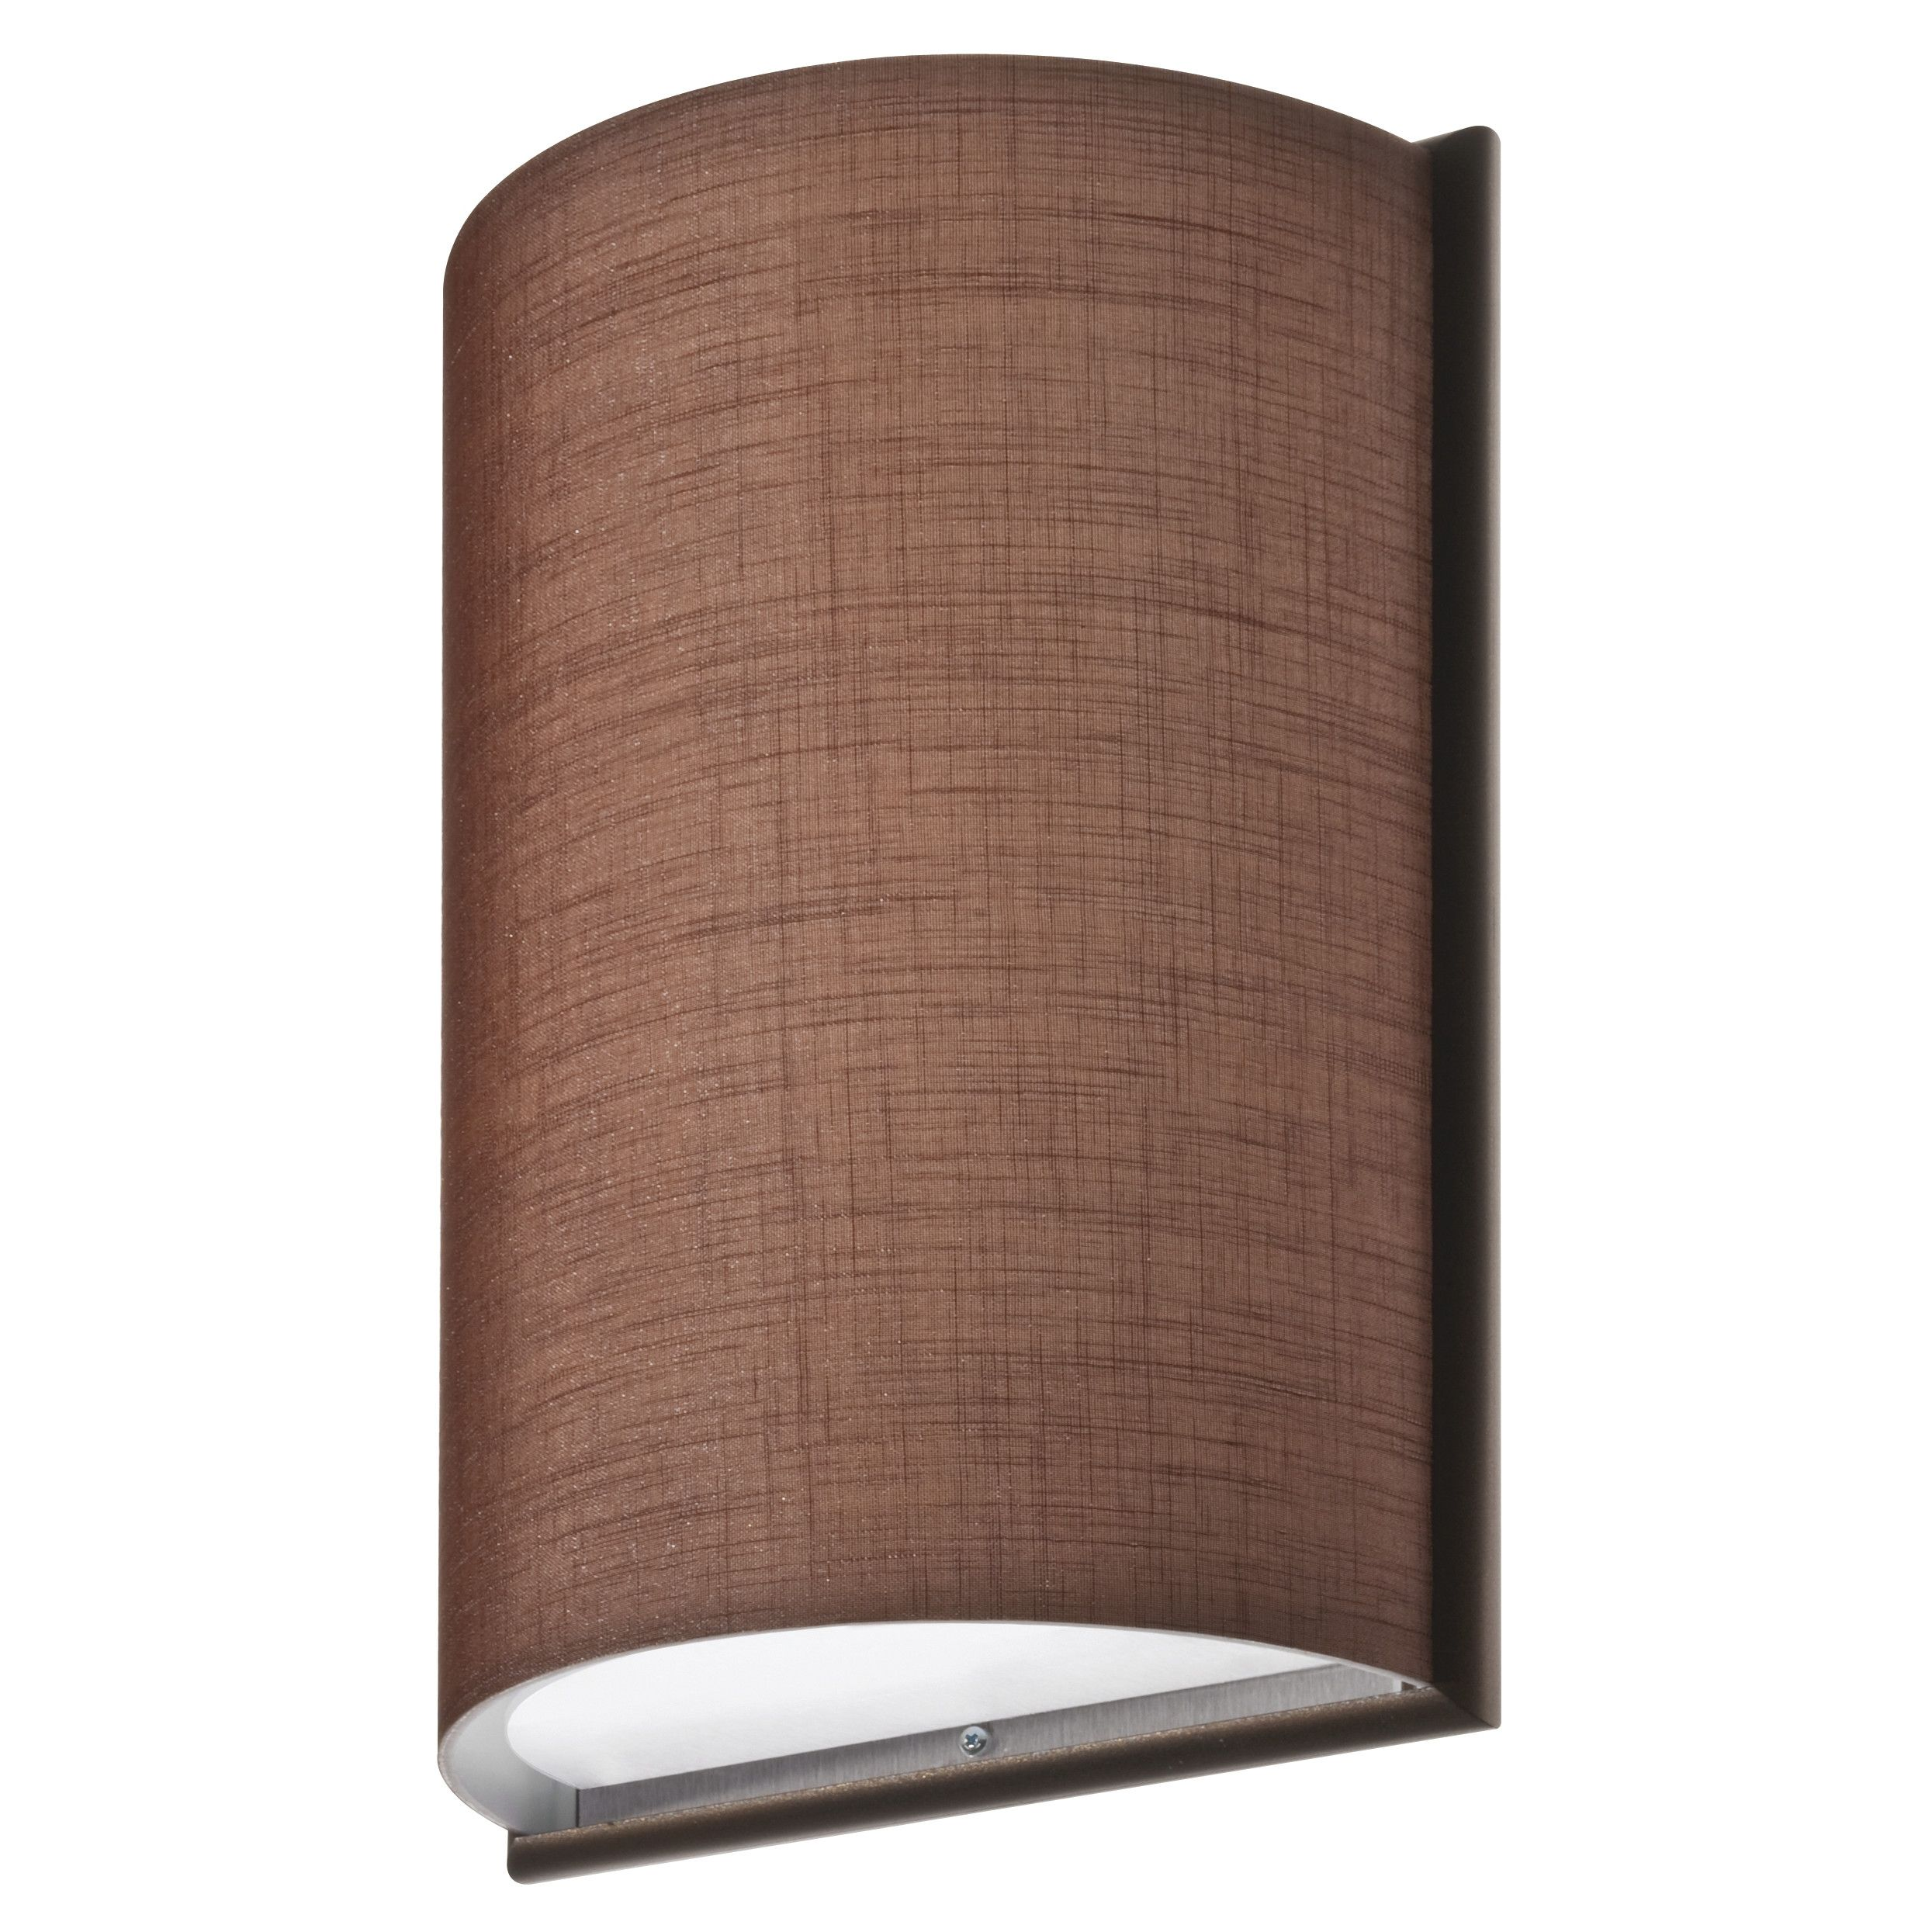 Lithonia Led Bathroom Lighting lithonia lighting lithonia decorative indoor small half cylinder